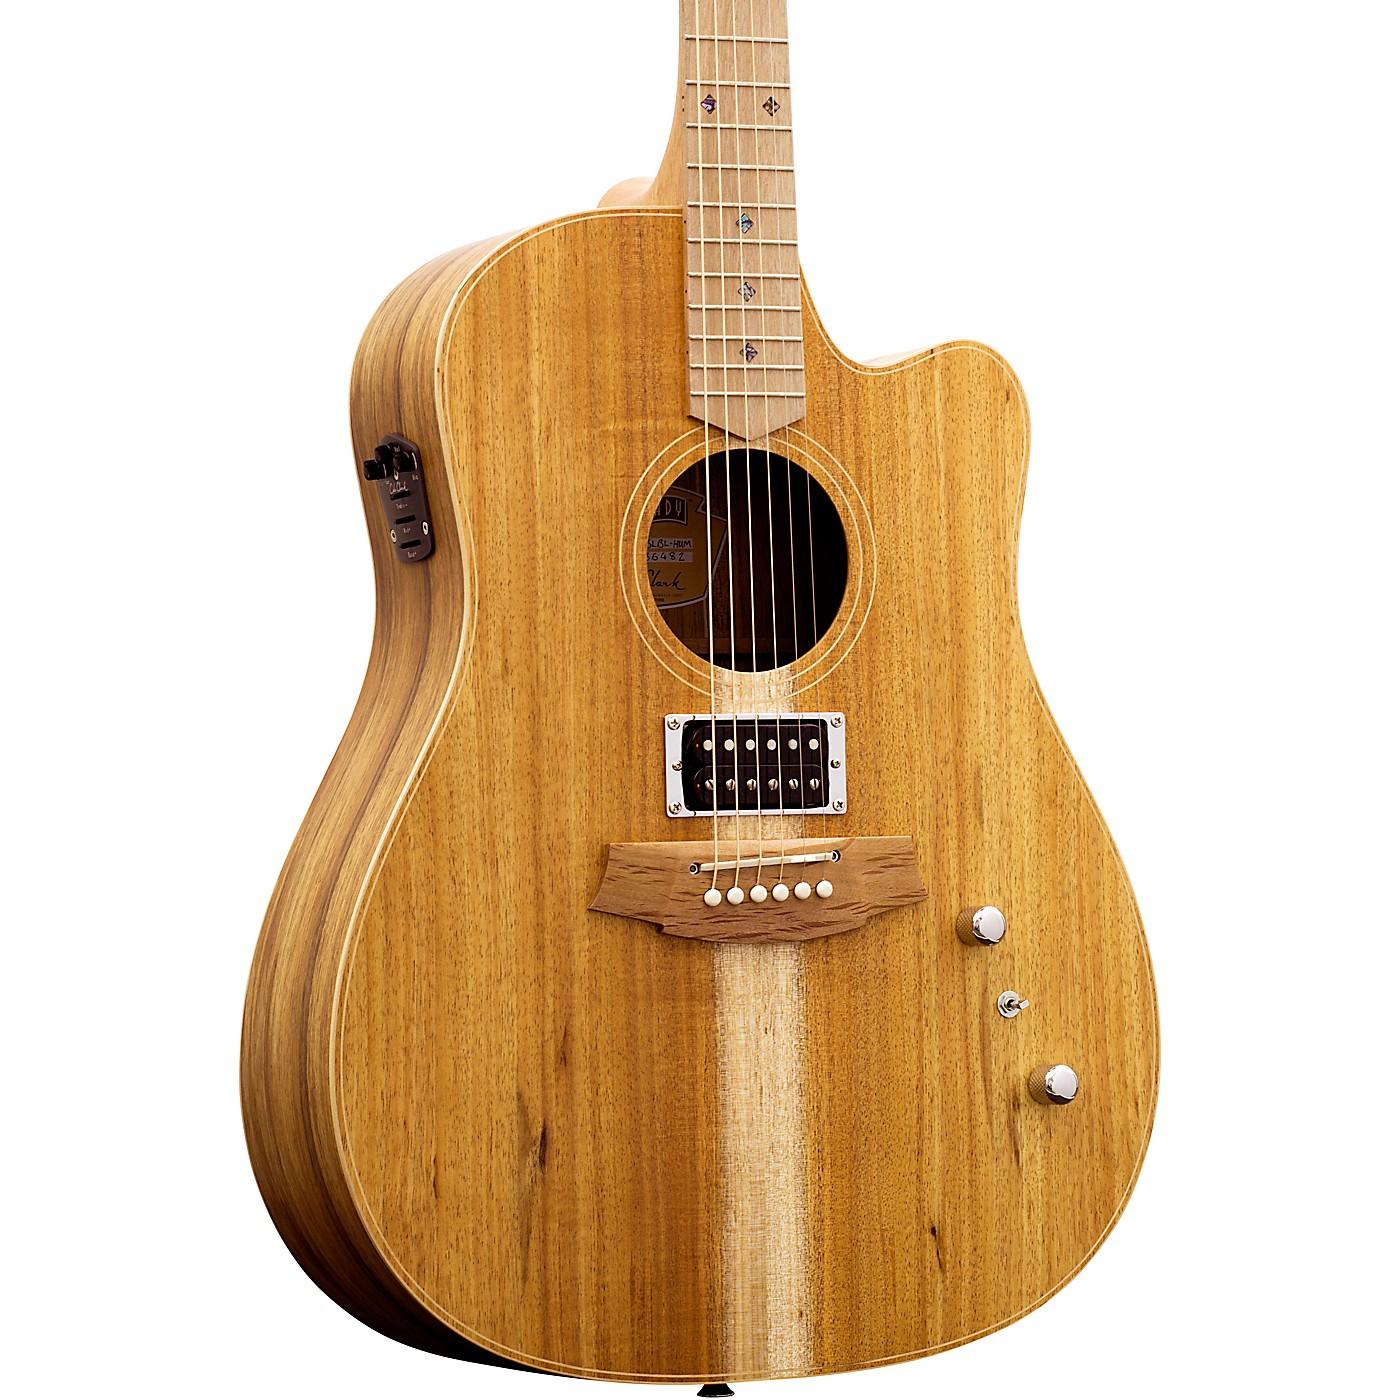 Cole Clark Fat Lady 2 Series Australian Blackwood Dreadnought Humbucker Acoustic-Electric Guitar thumbnail